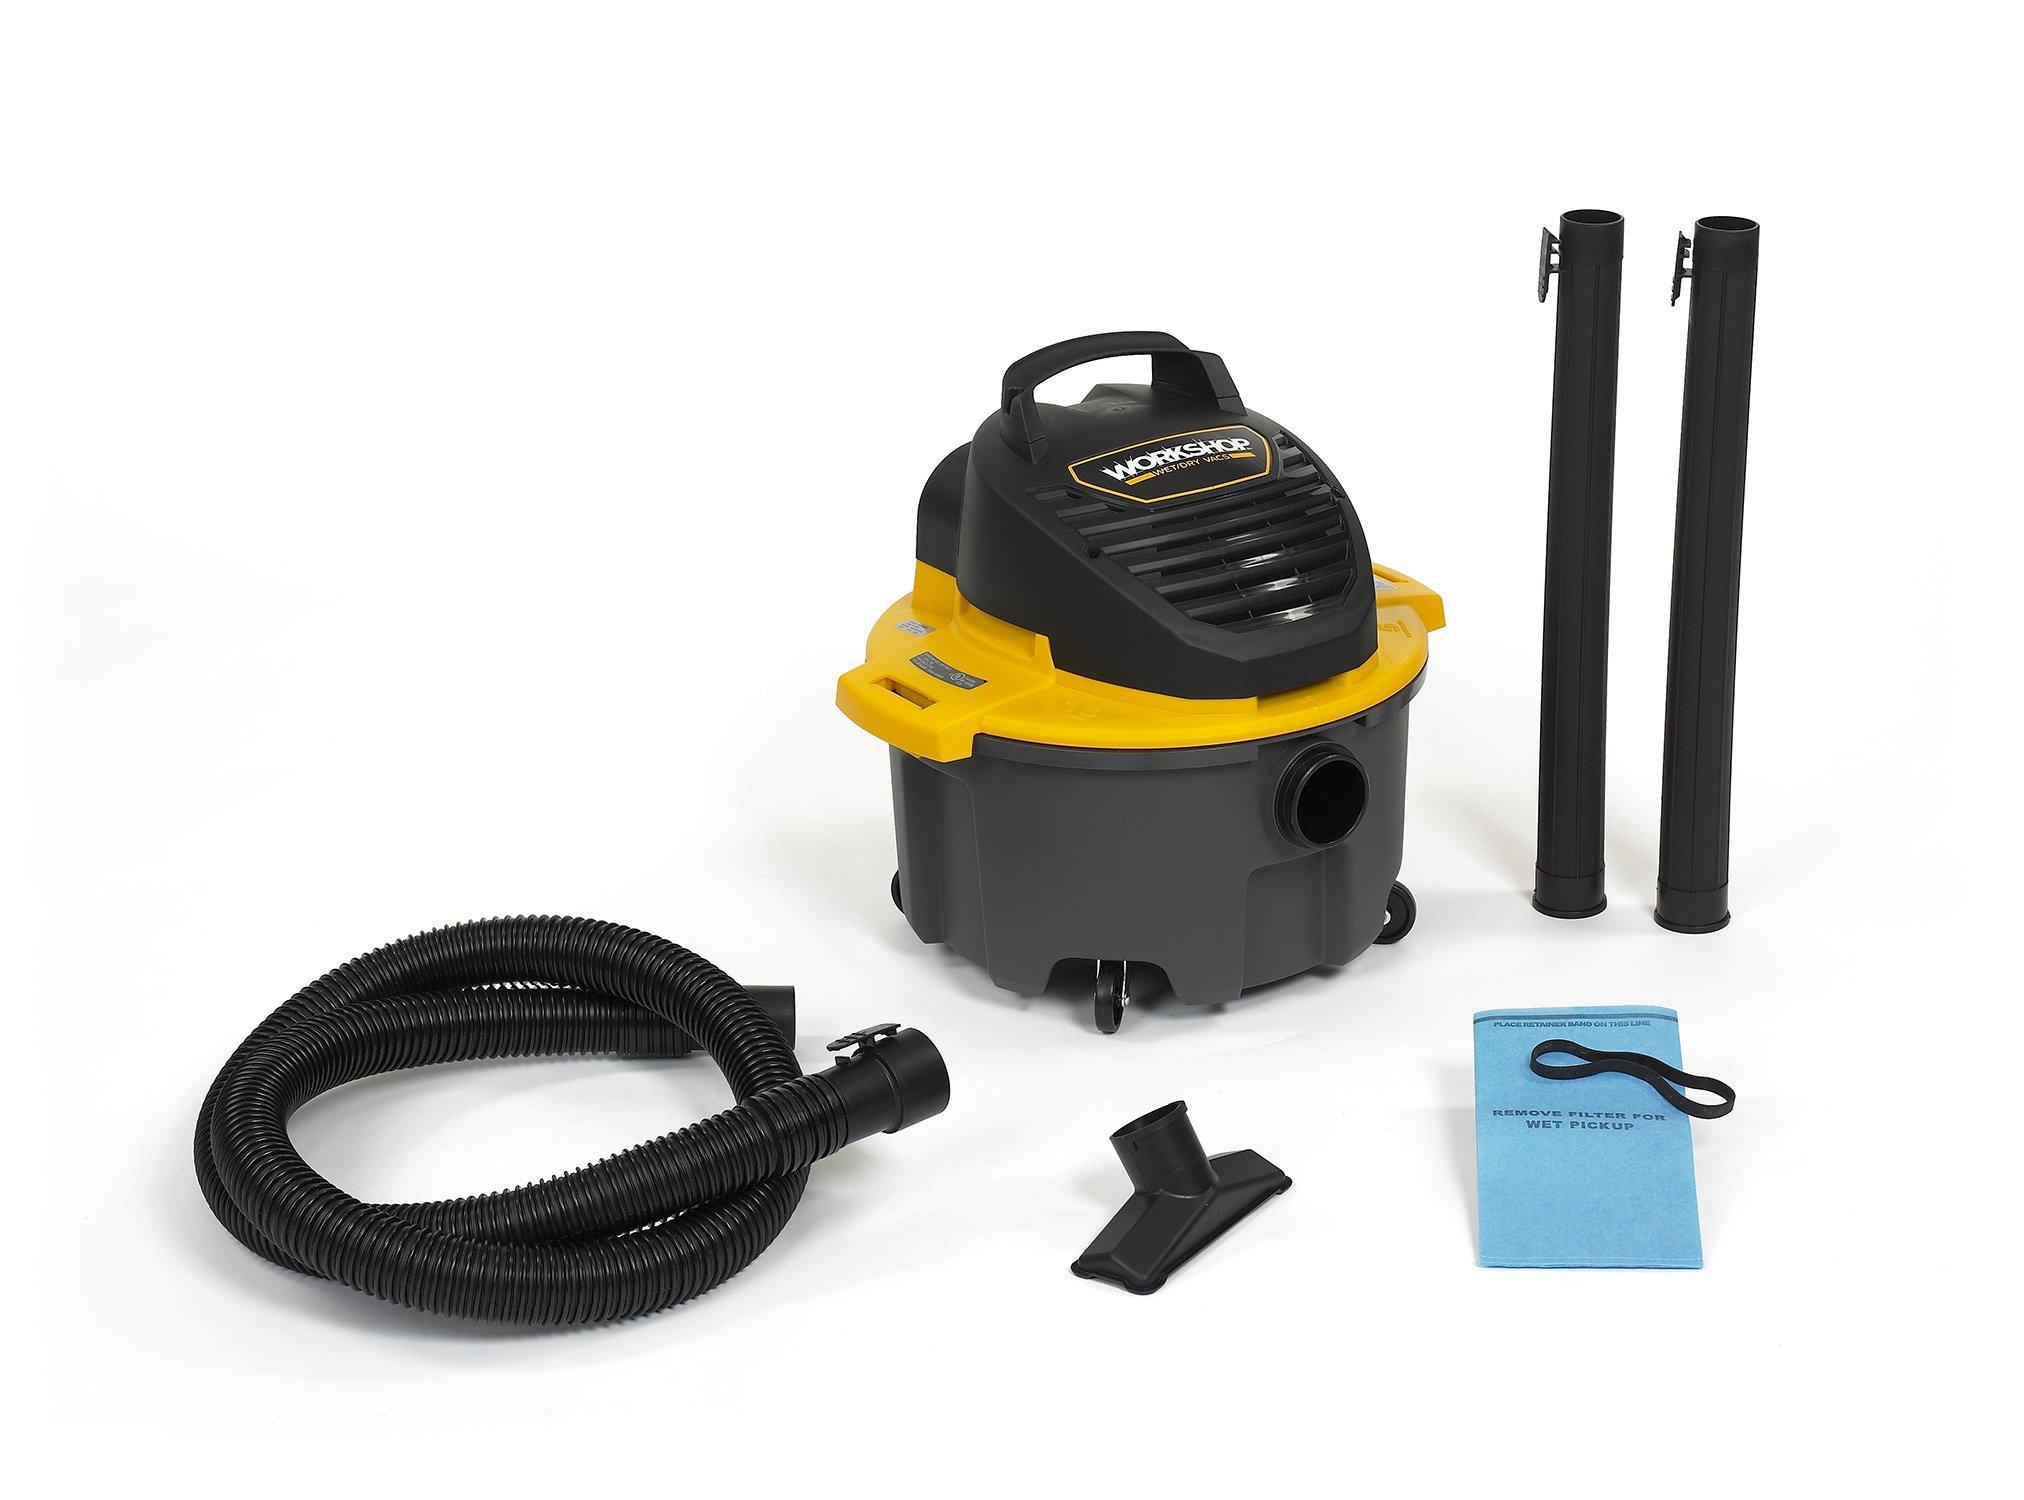 WORKSHOP Wet Dry Vac WS0500VA Portable Wet Dry Vacuum Cleaner, 5.0-Gallon Small Shop Vacuum Cleaner, 2.5 Peak HP Portable Vacuum